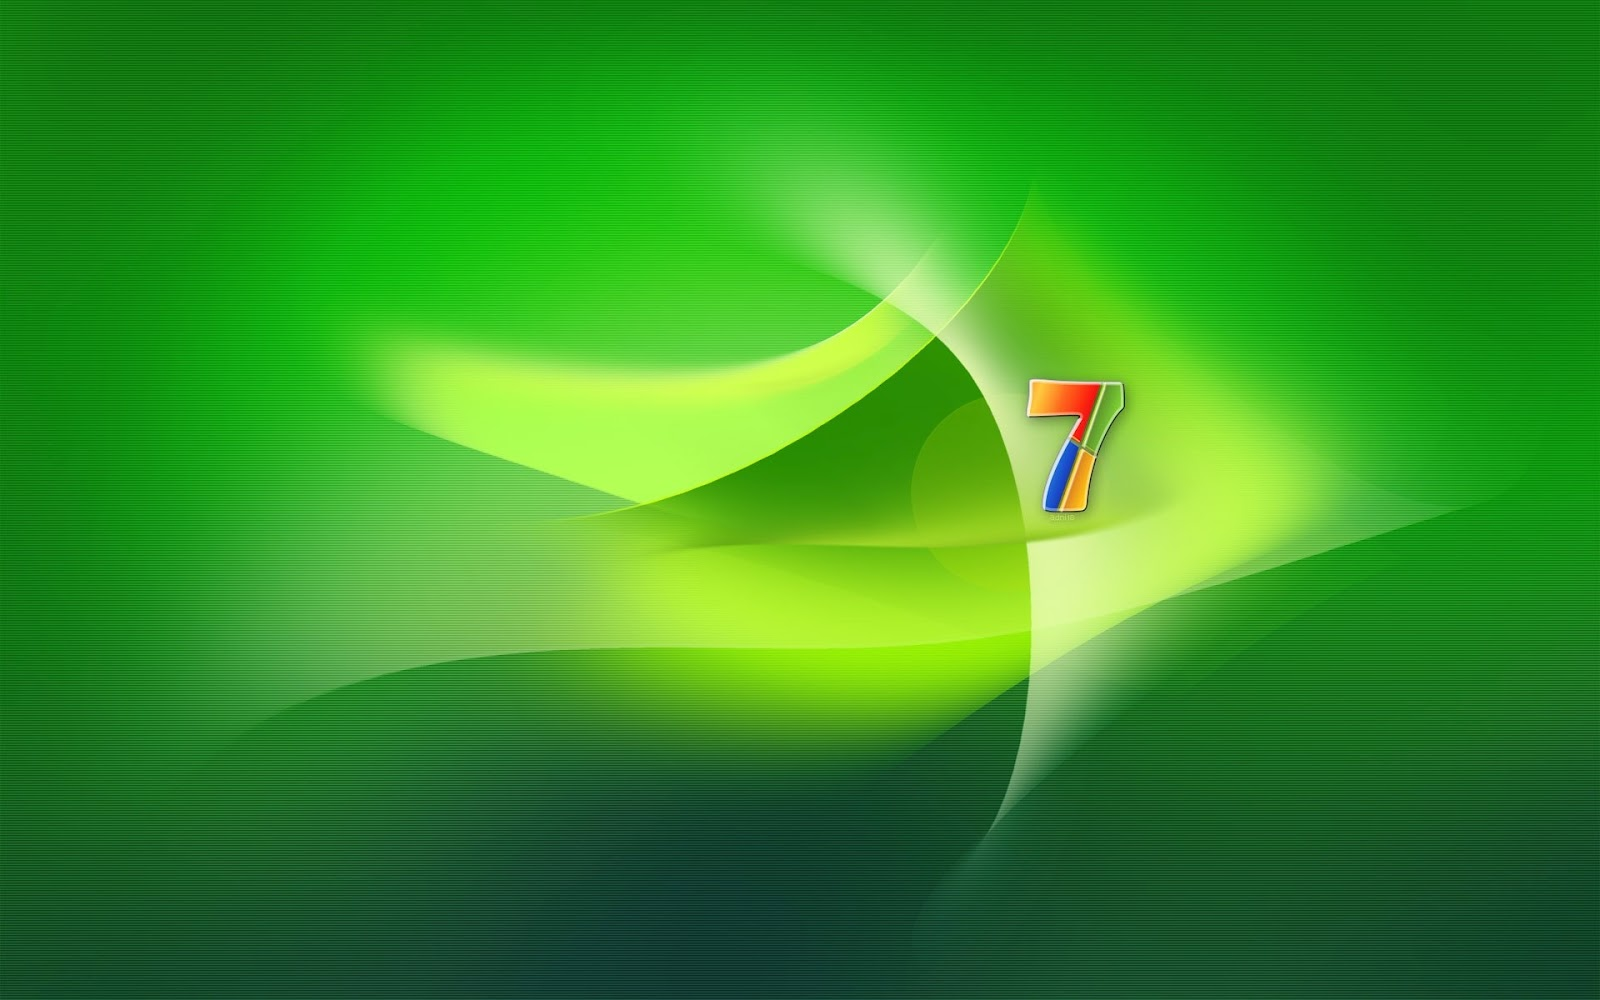 Smack Tricks •♥♪: How To Change Windows 7 Logon Screen